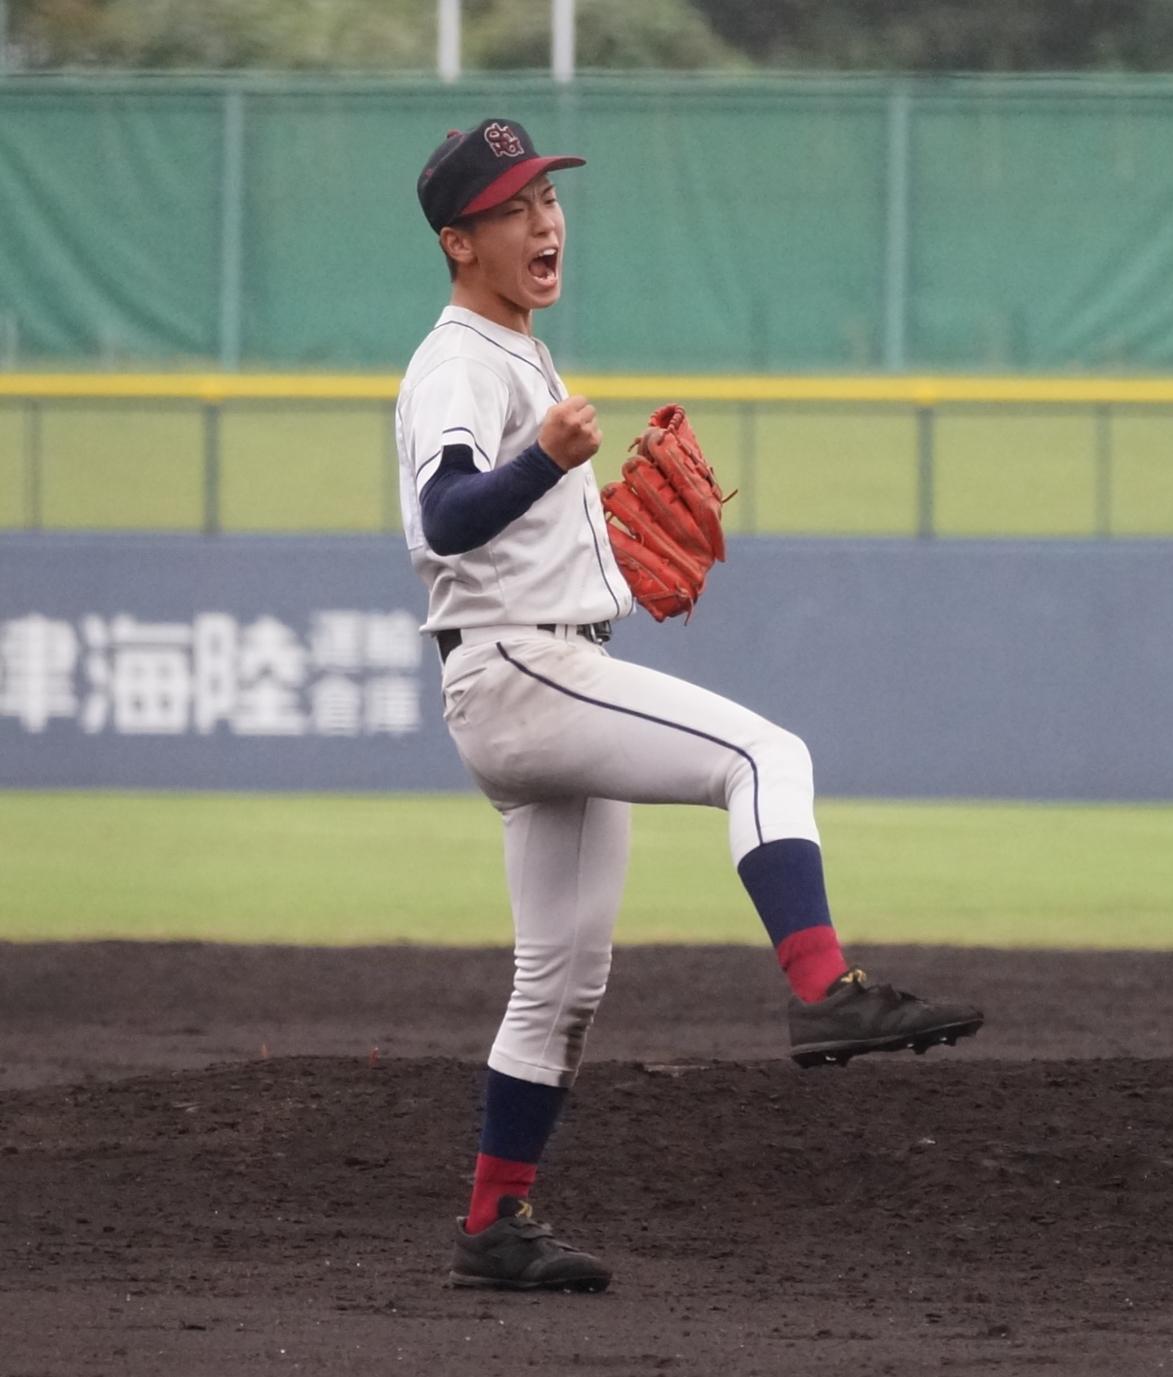 野球 高校 爆 サイ 長野 県